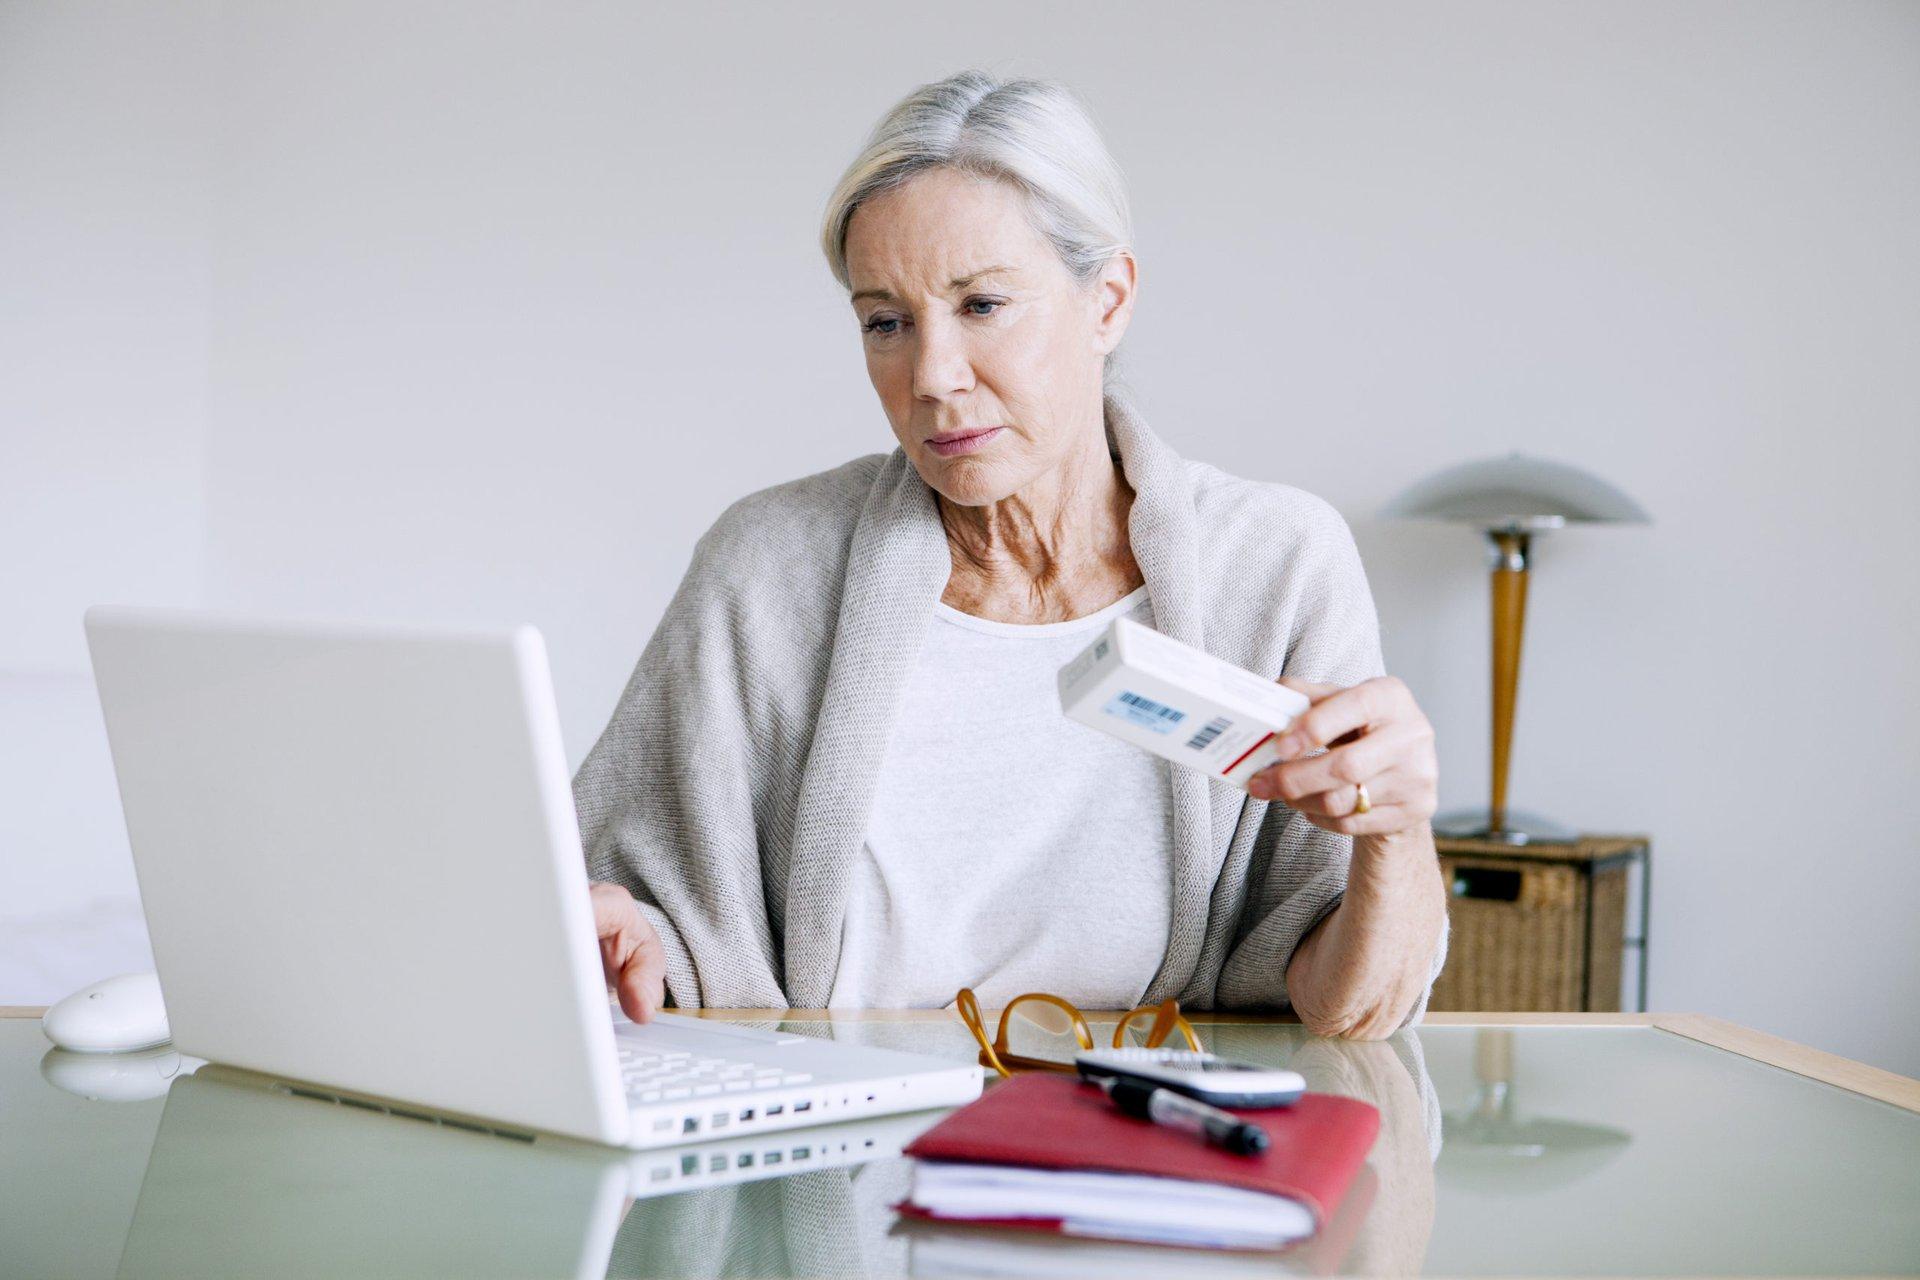 Woman ordering prescription drugs online